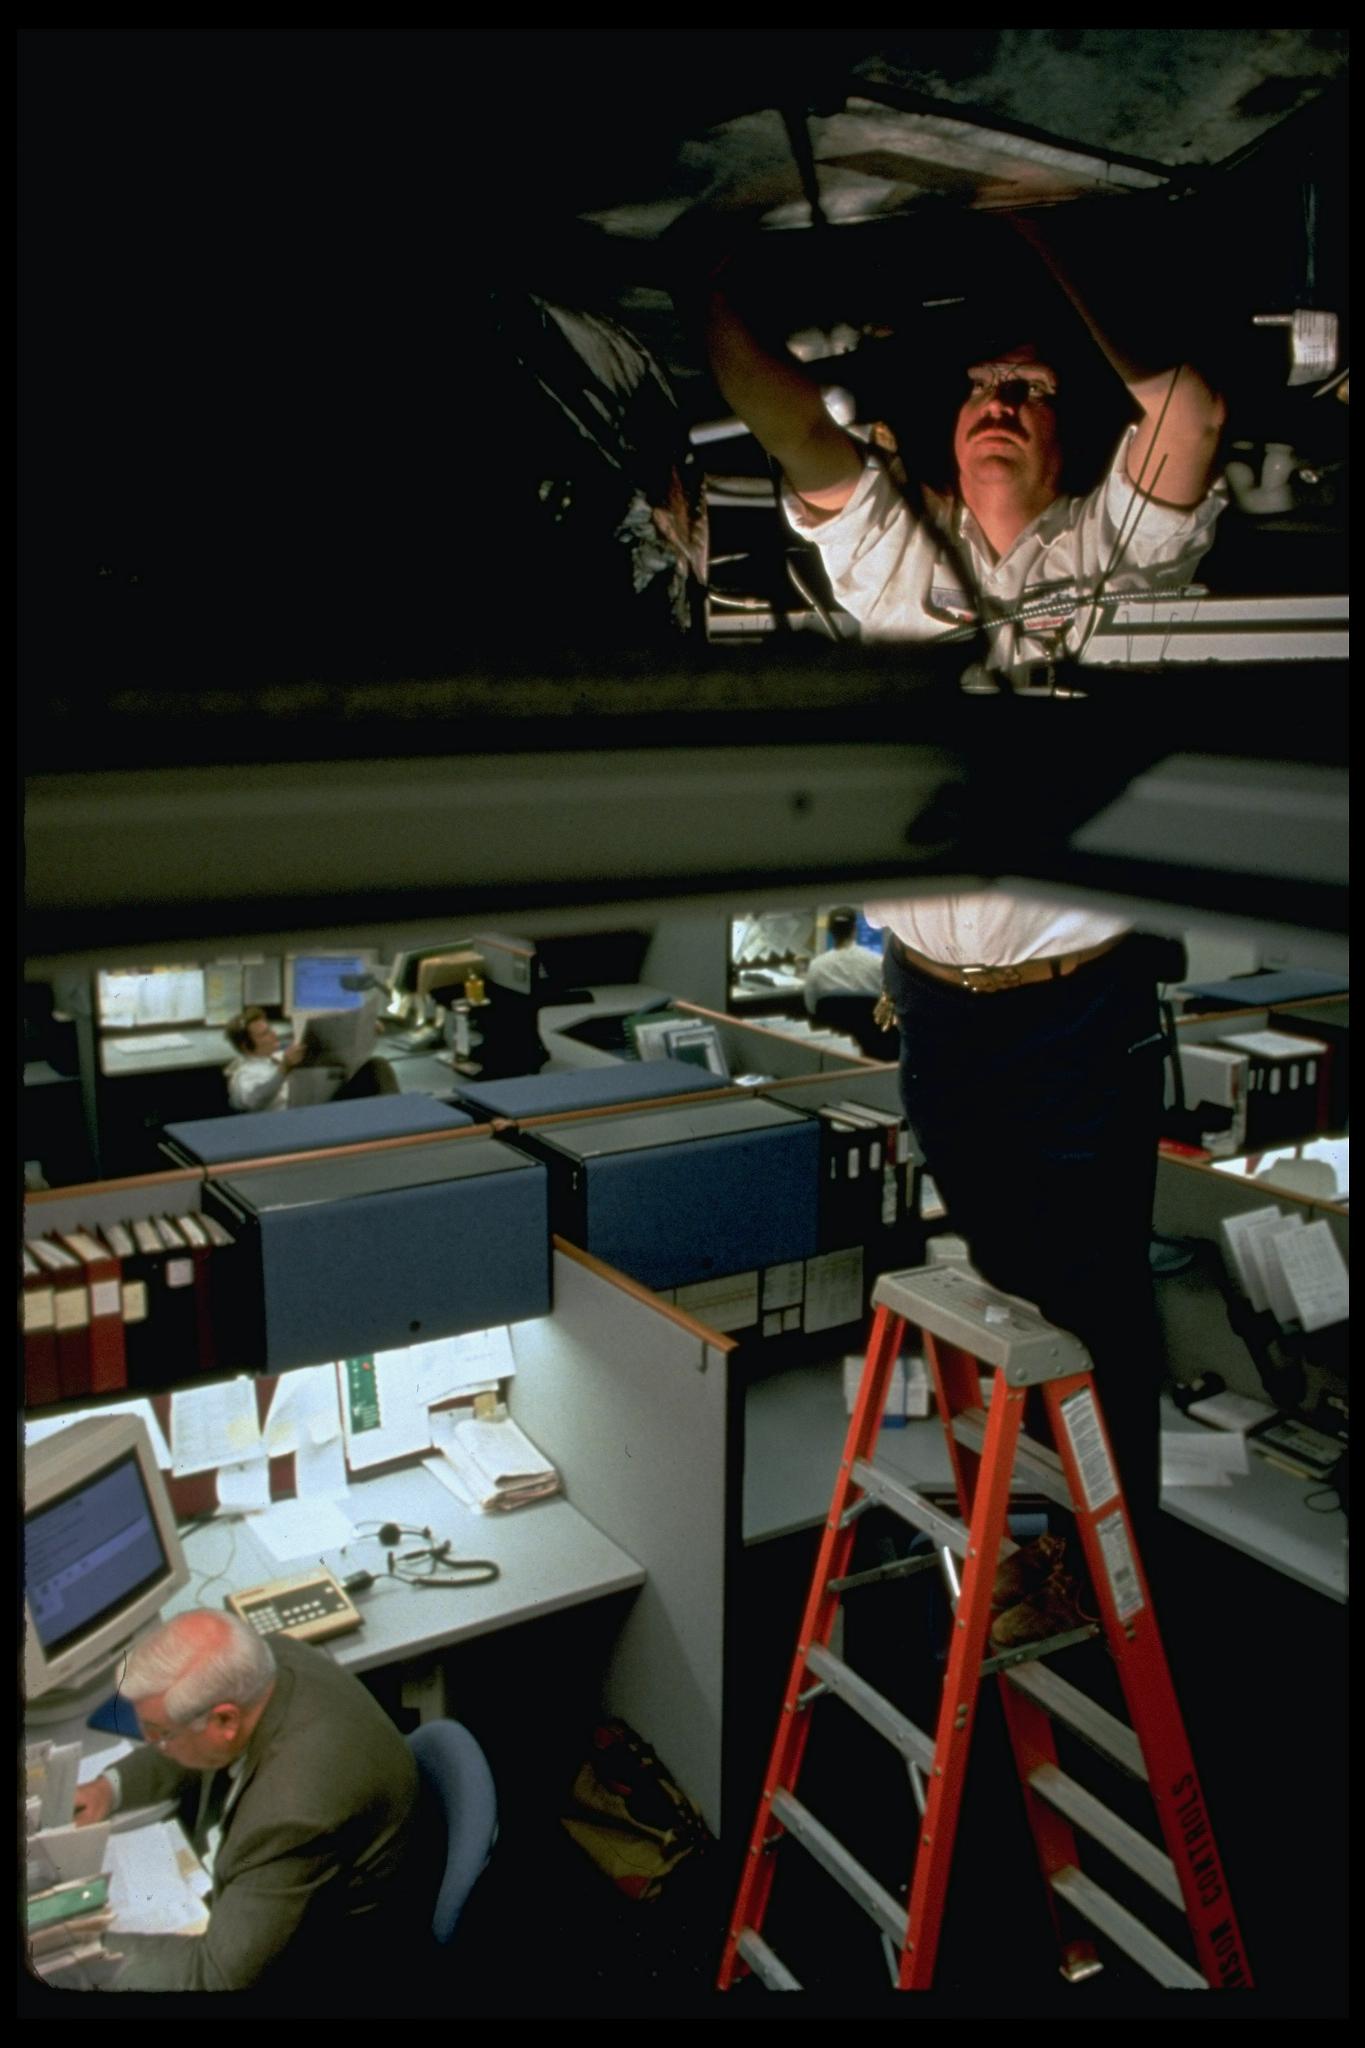 Johnson Controls worker servicing someth